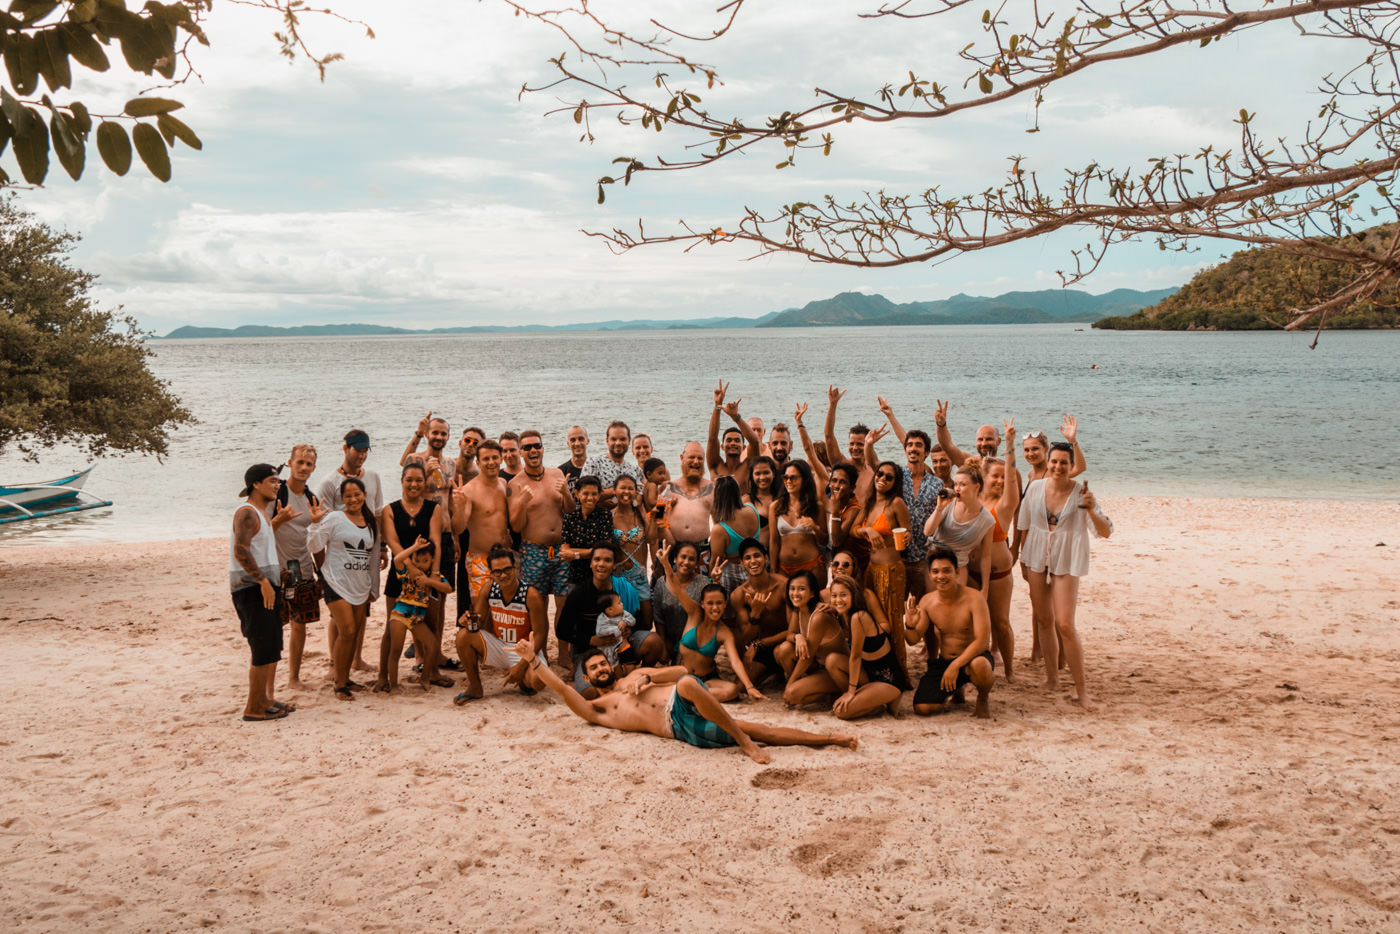 Geburtstag auf Calambuyan Island